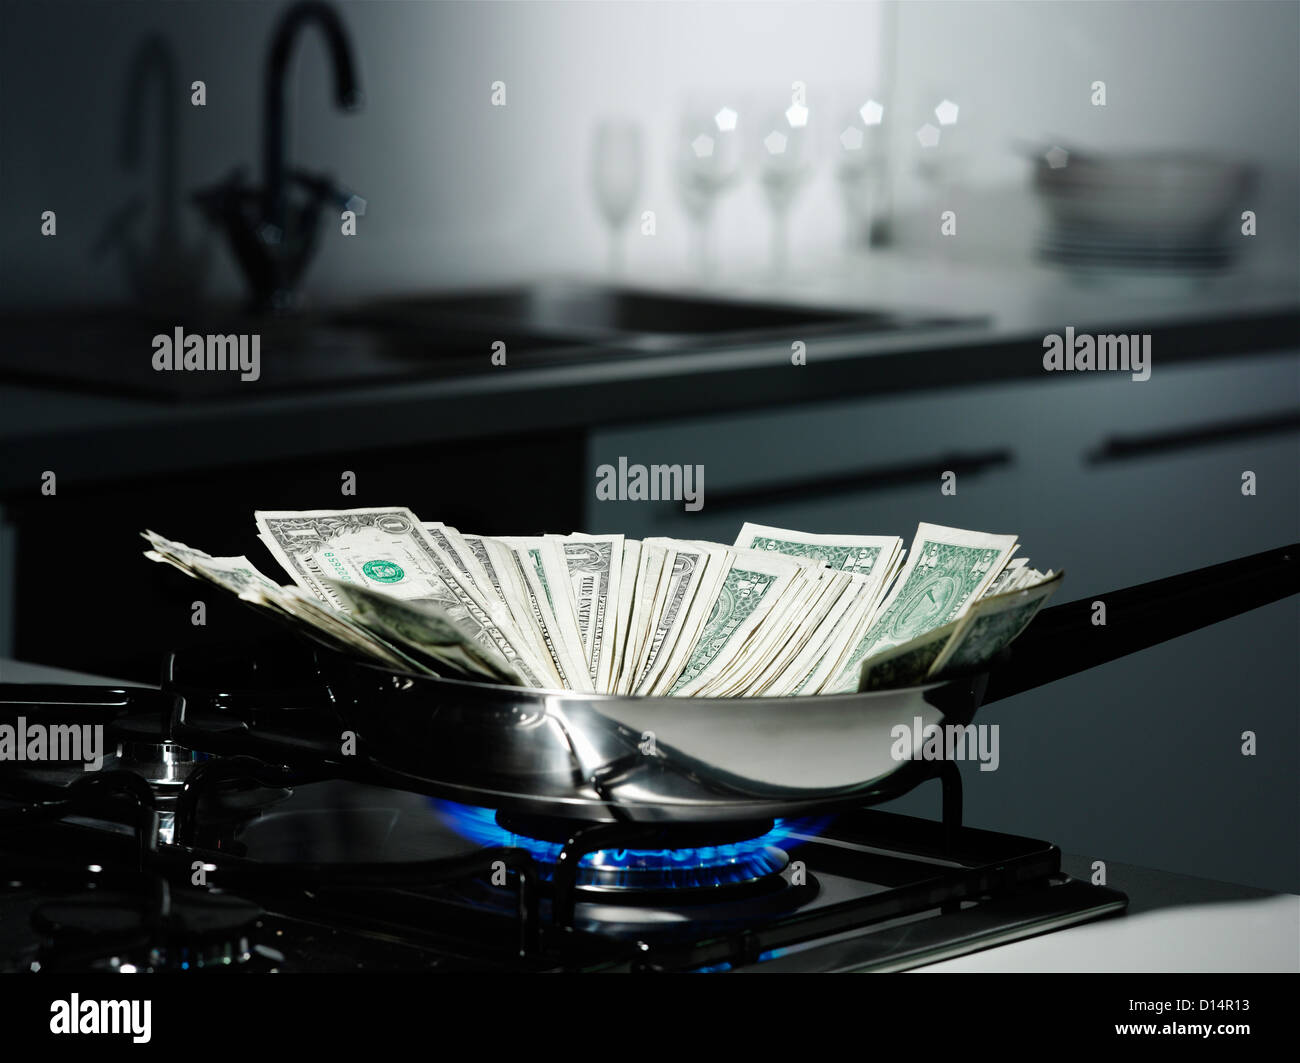 Dollar bills in frying pan on stove - Stock Image